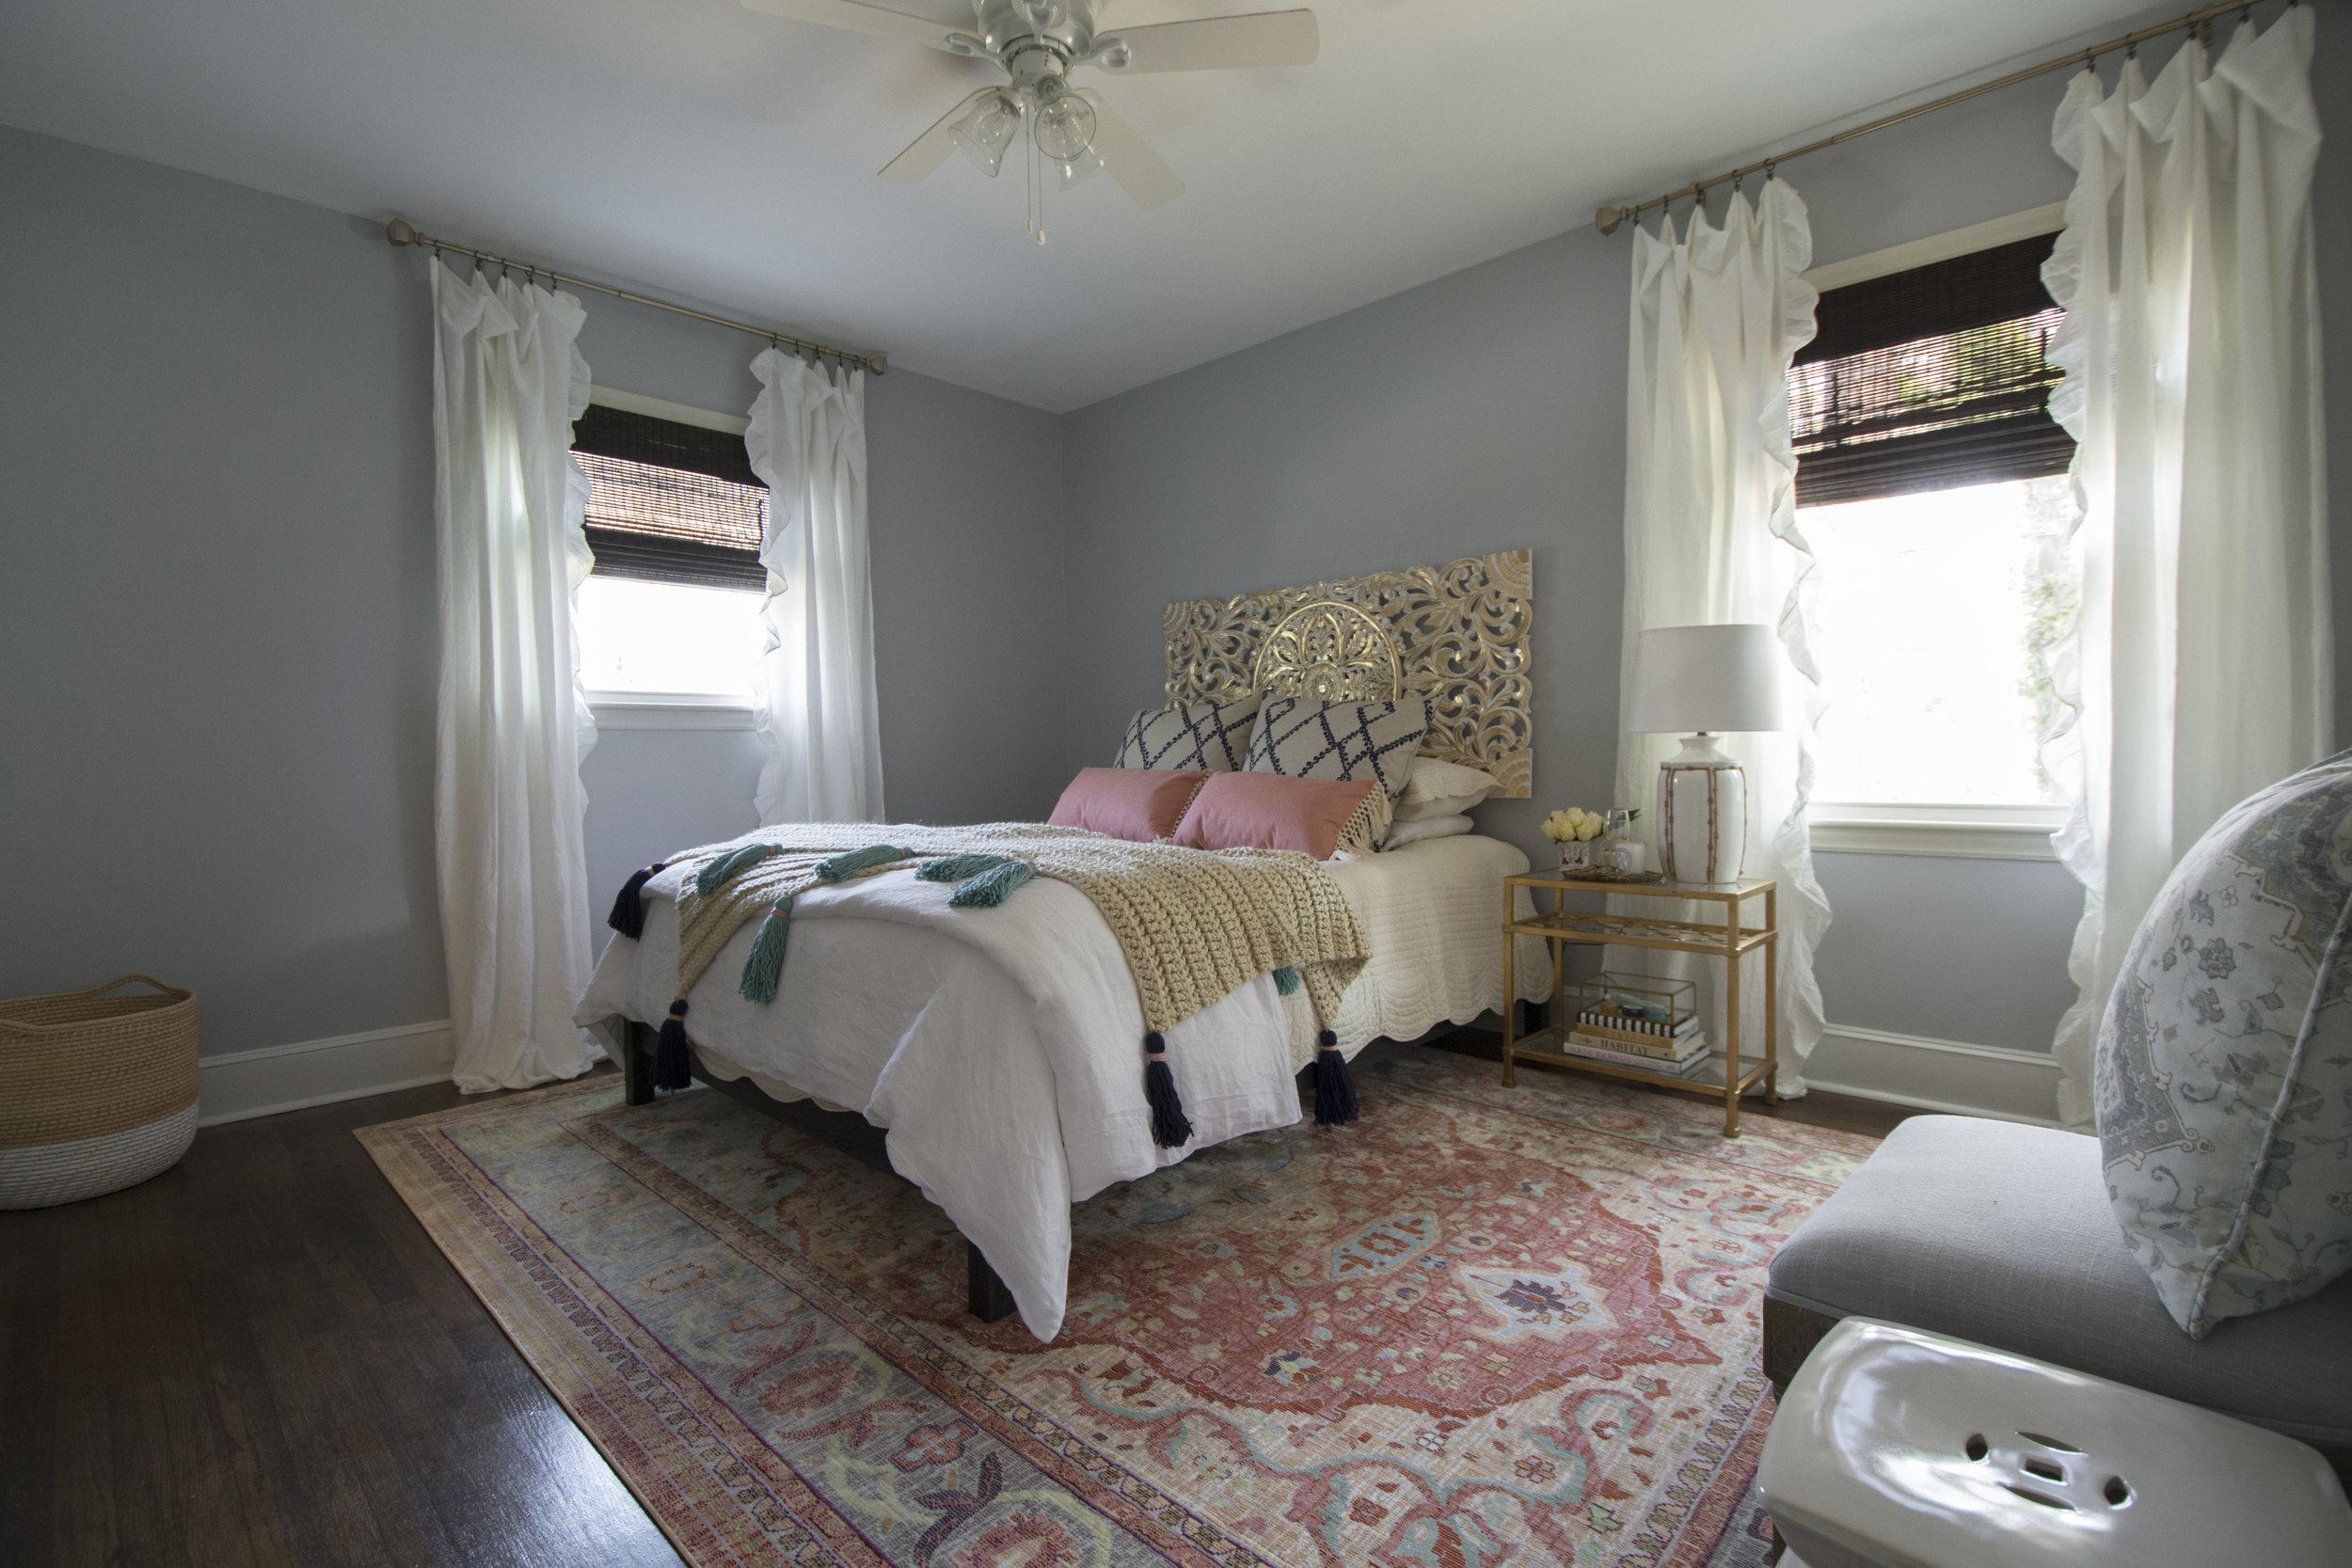 Artful Interiors - Bohemian Bedroom - Full View